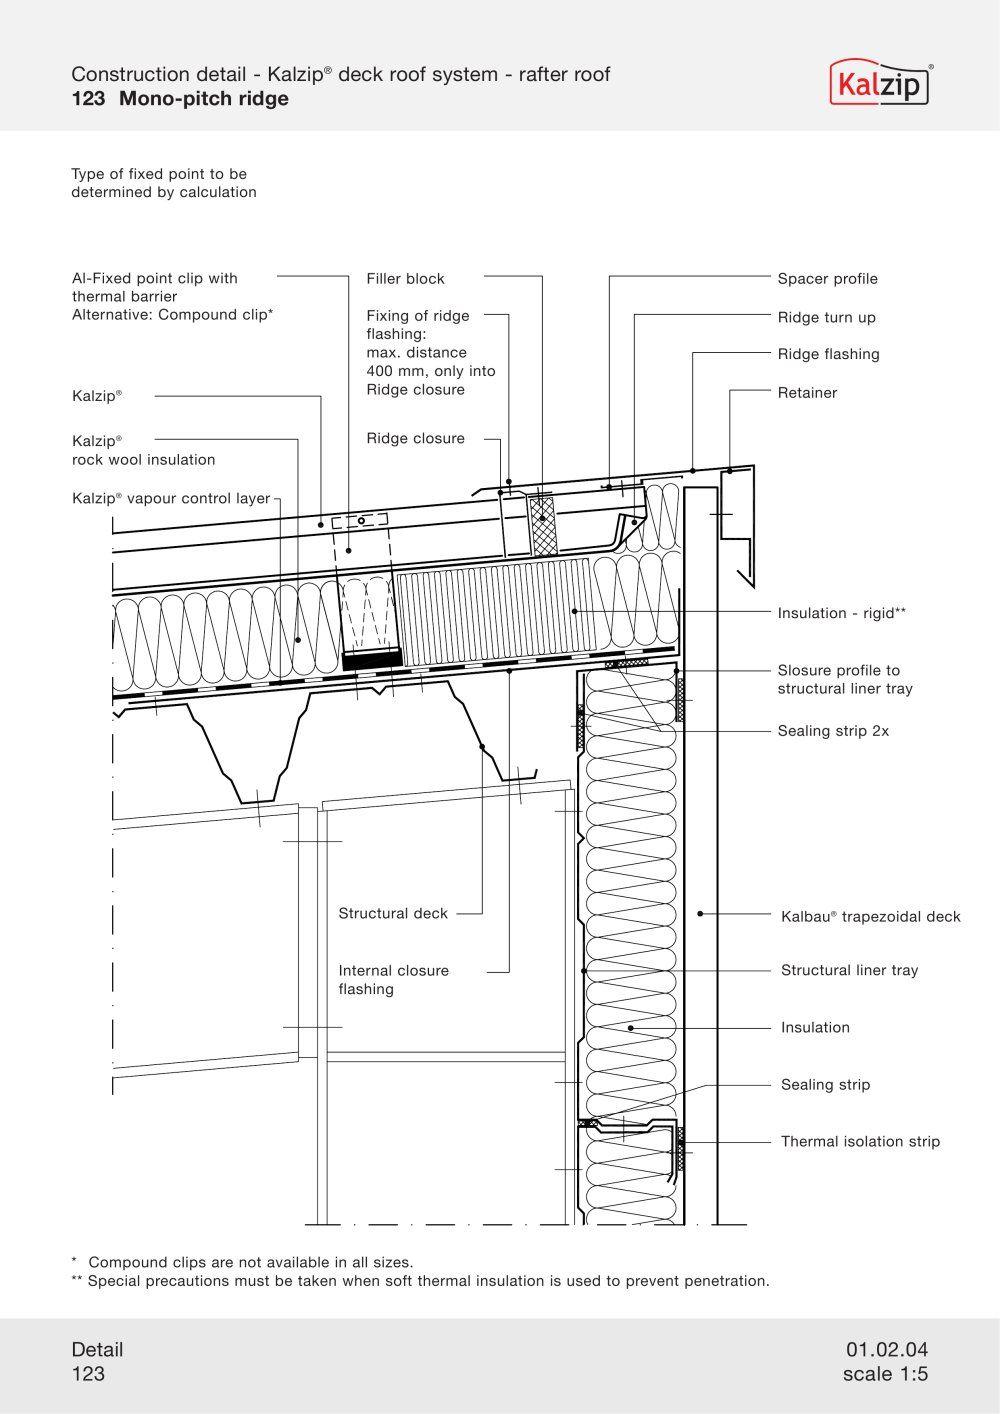 ecm wiring diagram for 4700 international